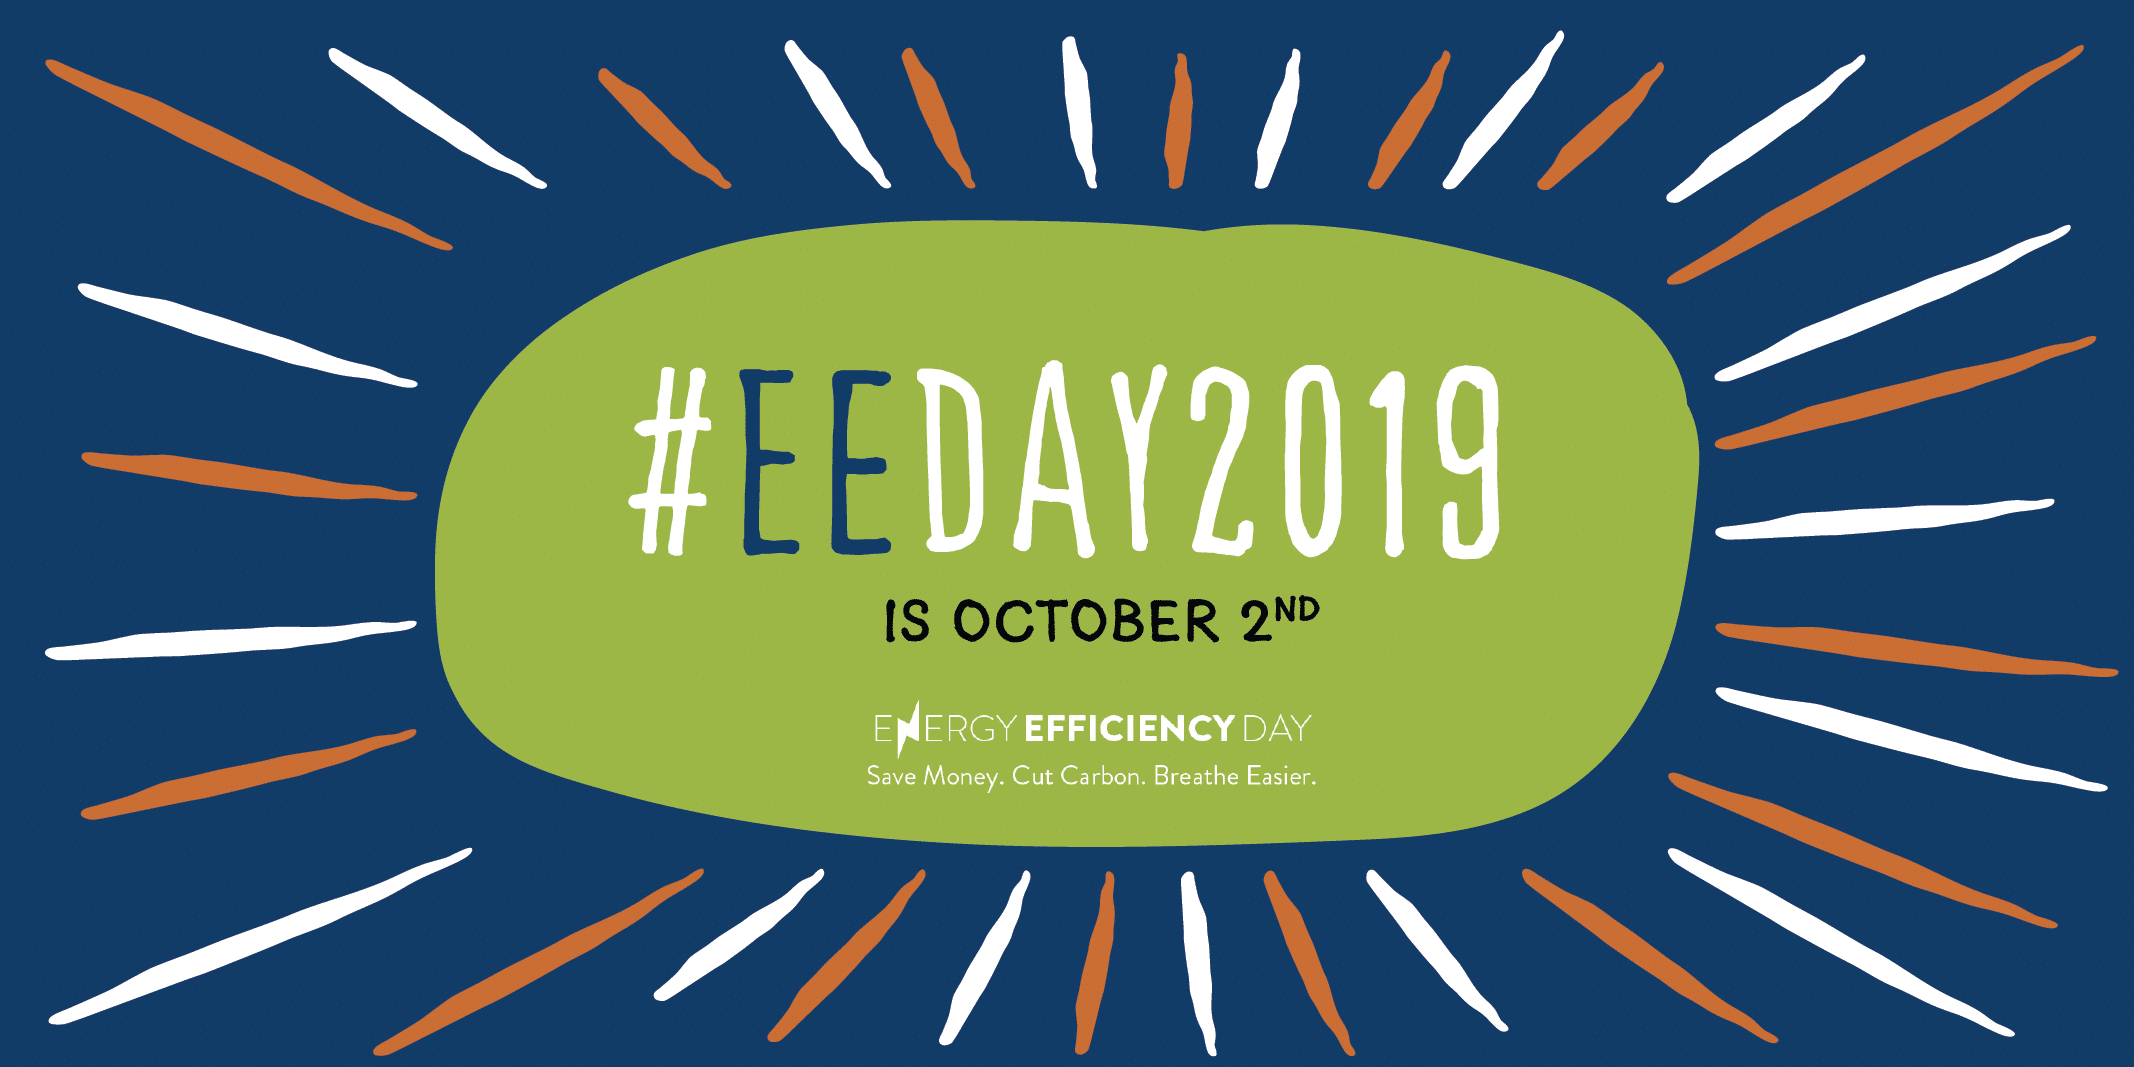 national-ee-day-2019-eeday2019-energy-efficiency-day-kw-engineering-energy-consultants